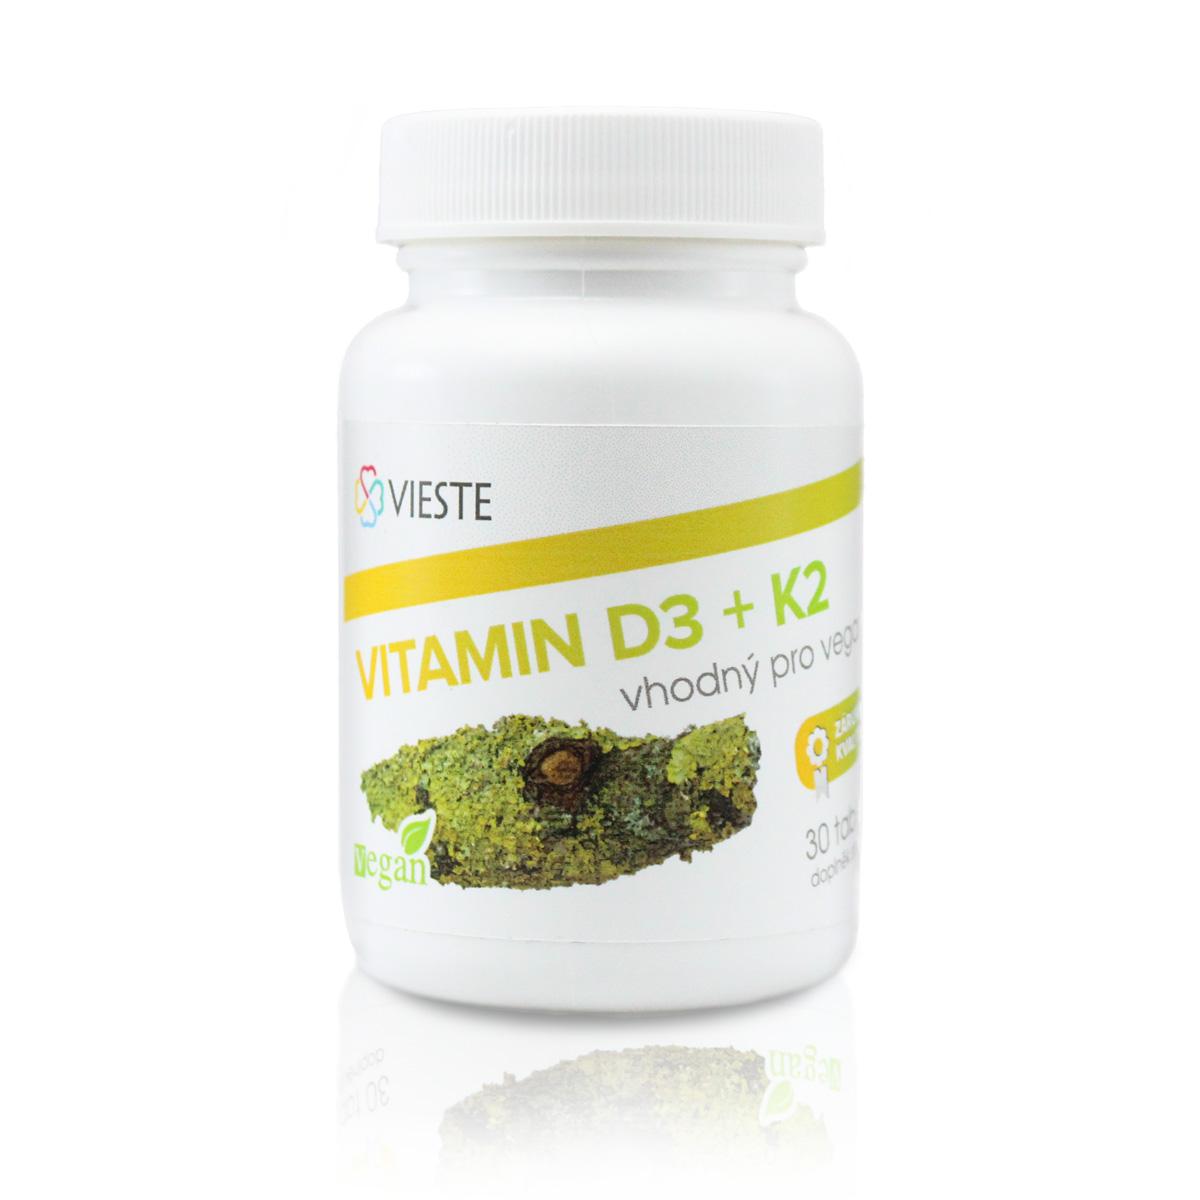 Vieste Vitamin D3 + K2 30 tbl